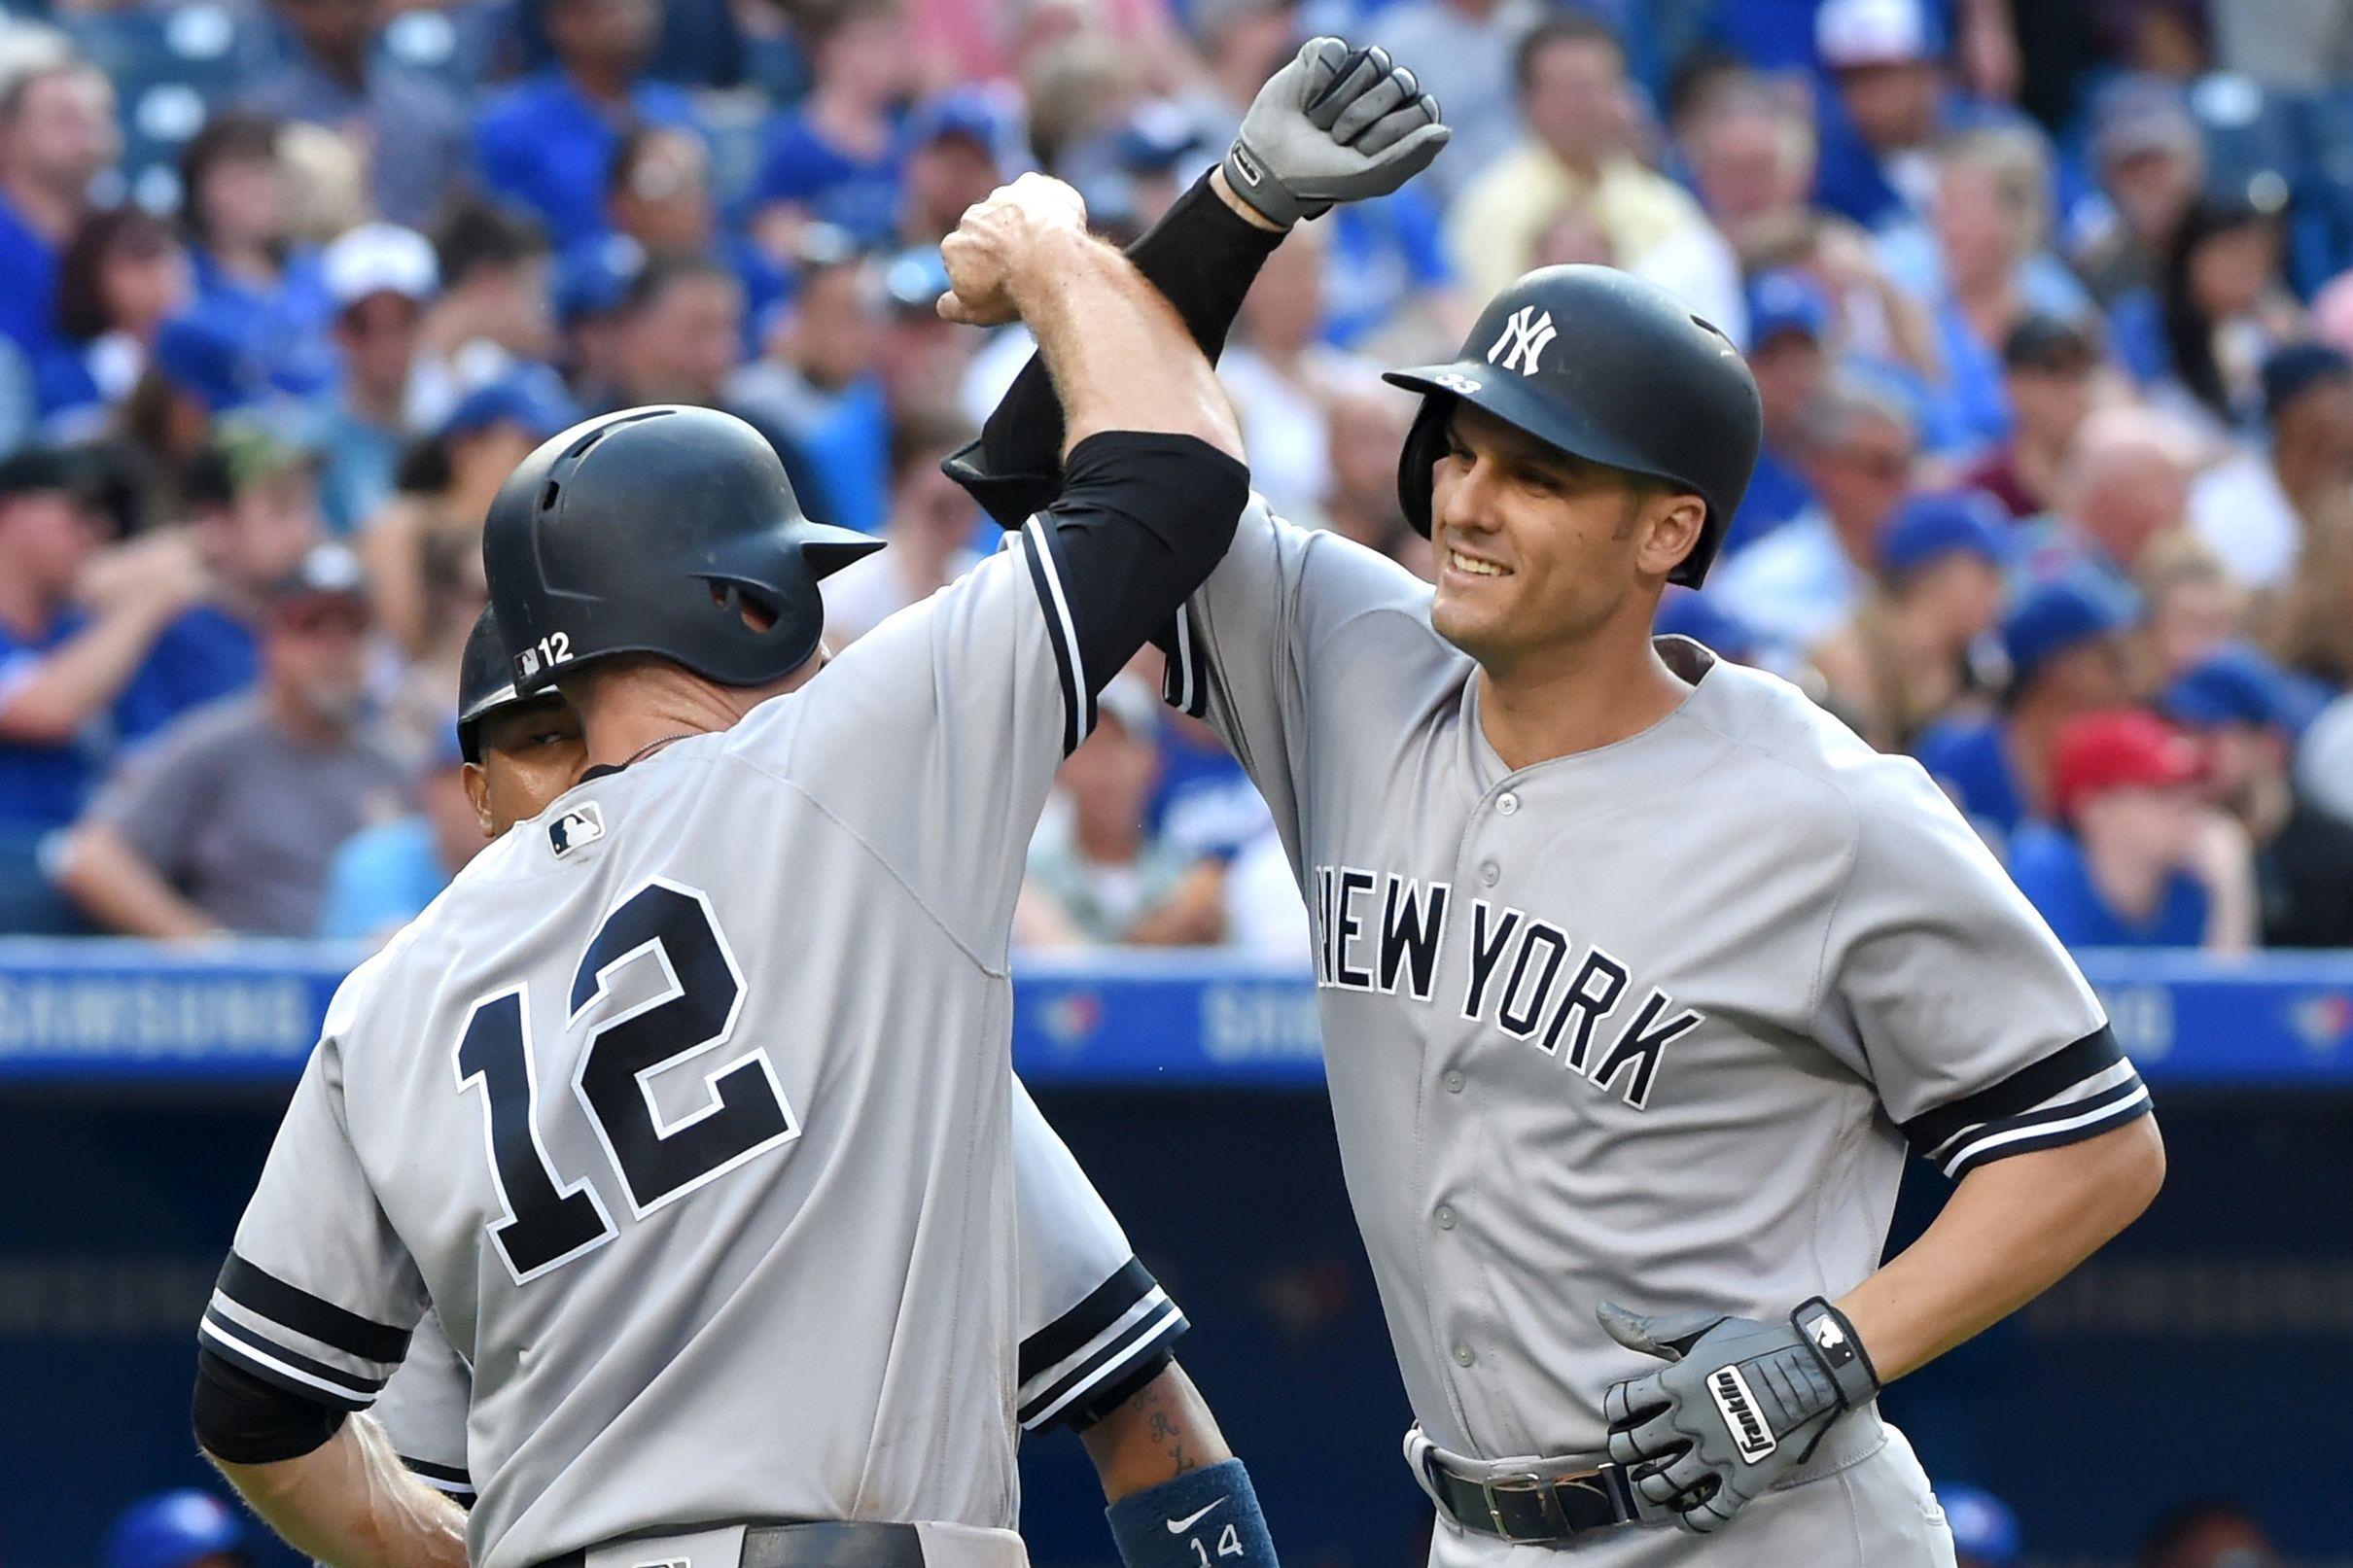 New York Yankees Clinch Playoff Berth Baseball T Shirt Designs New York Yankees American Baseball League